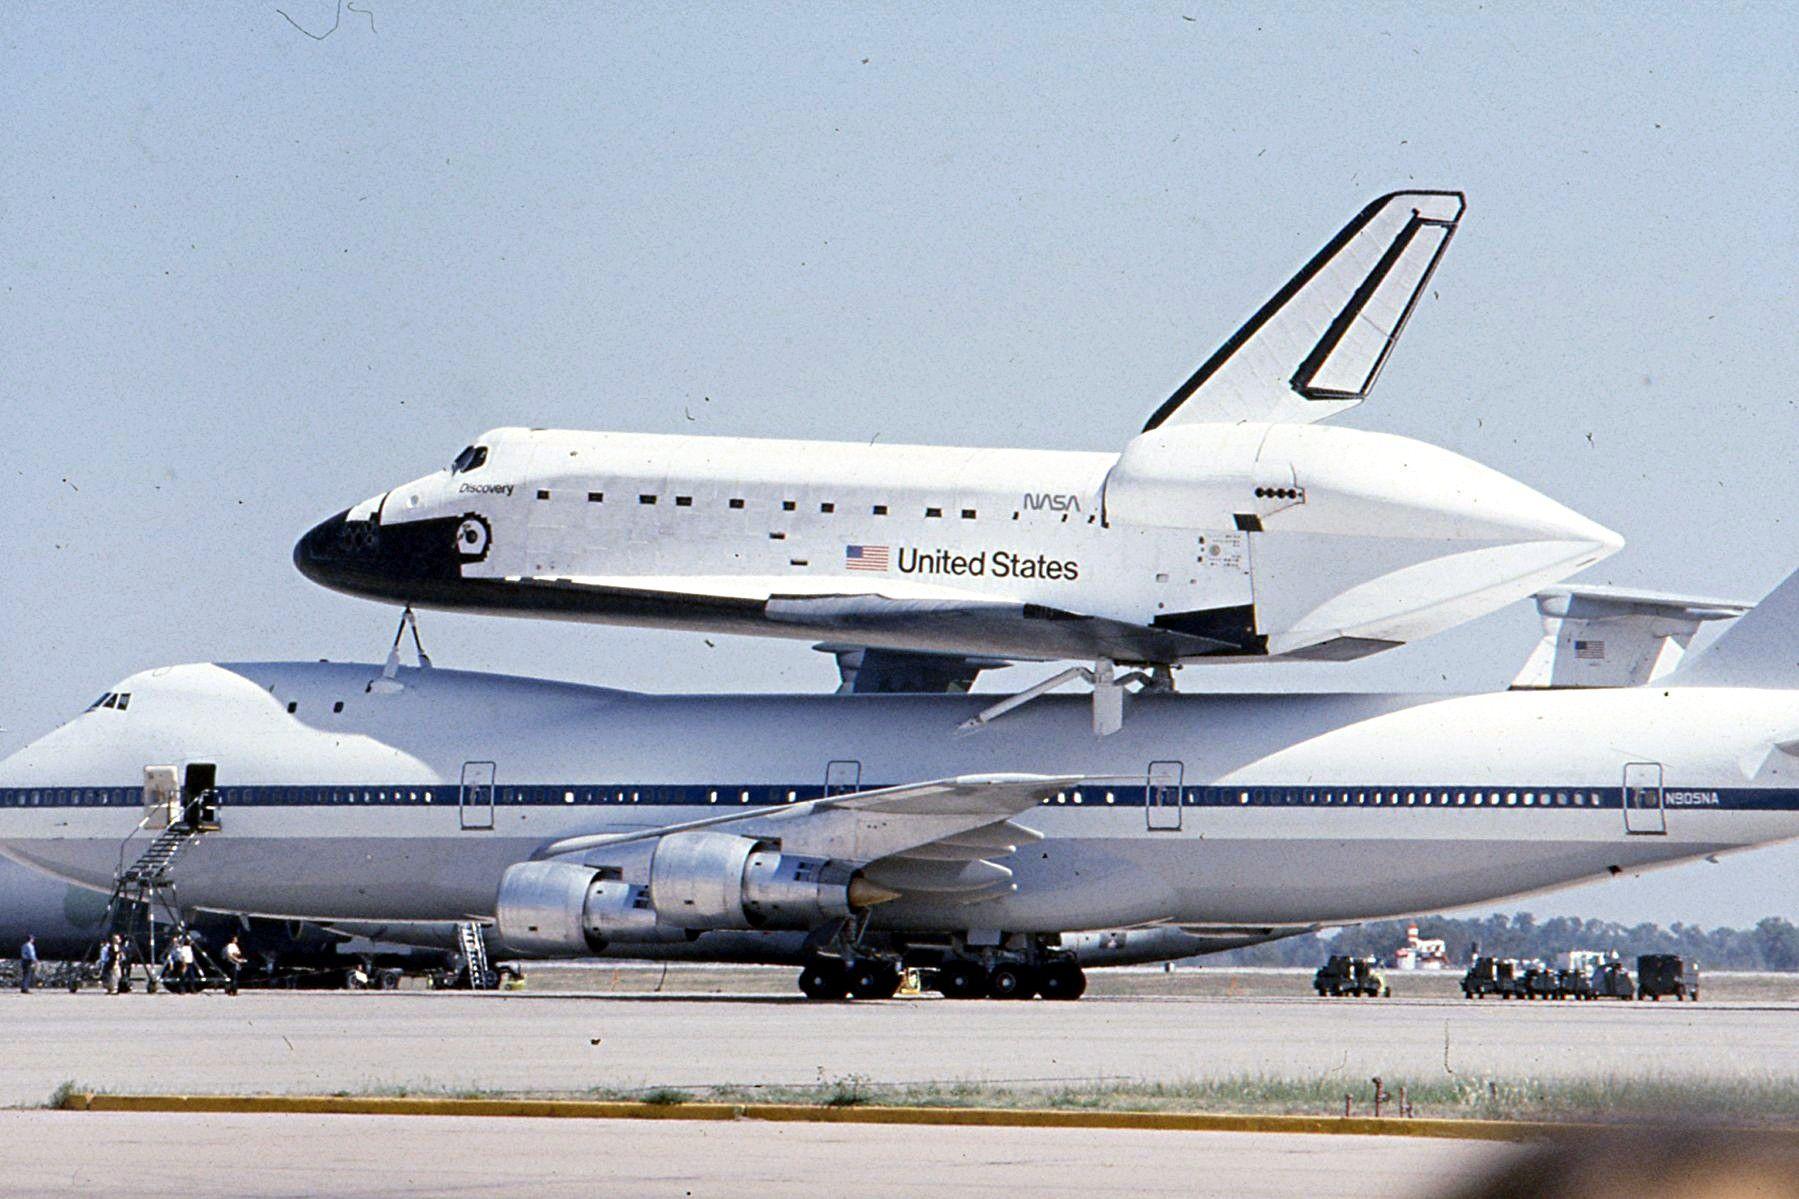 Altus küchengeräte ~ Space shuttle discovery at altus air force base altus oklahoma